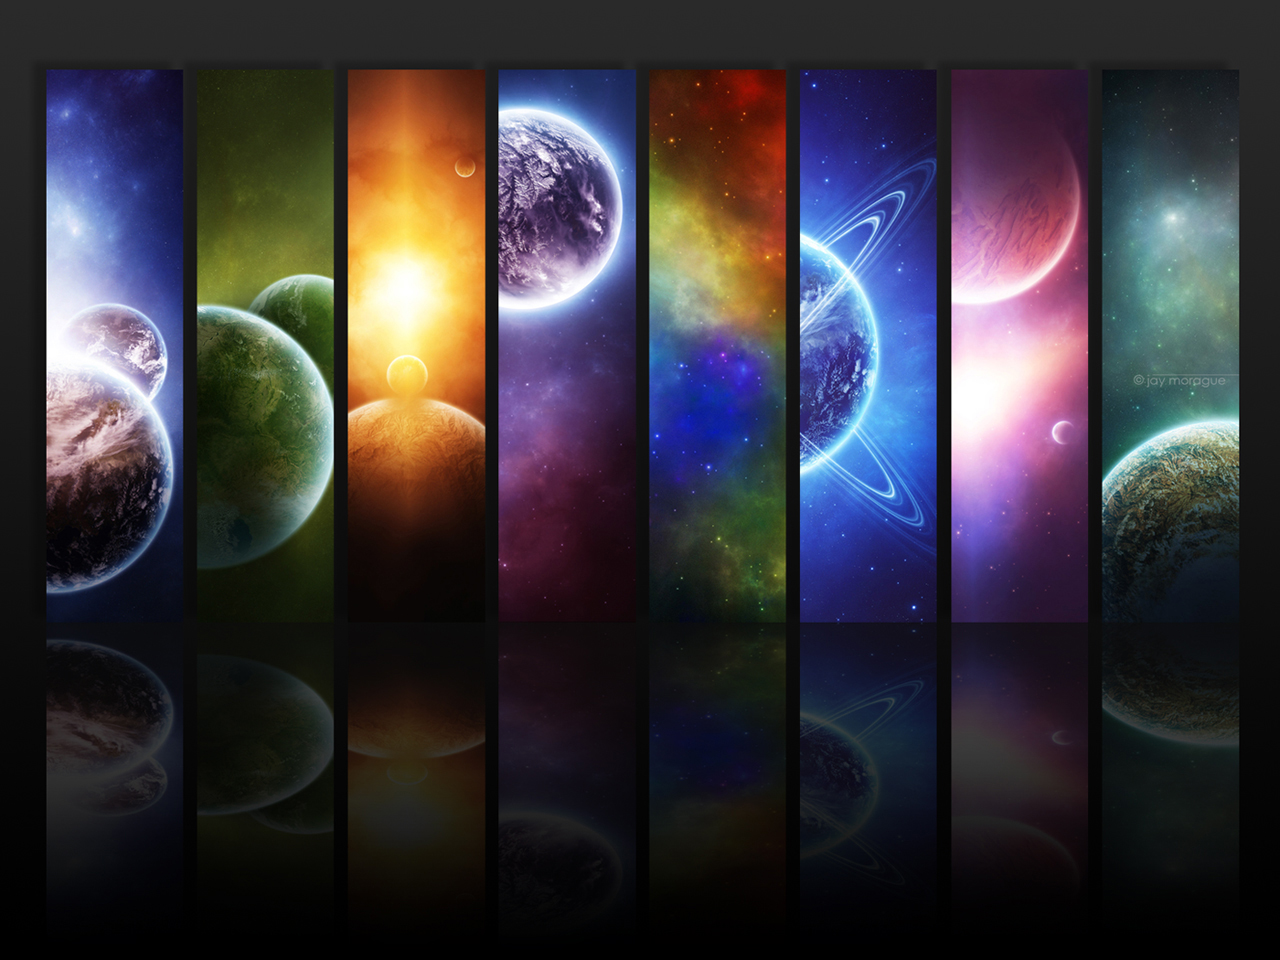 Infinity - Fullscreen